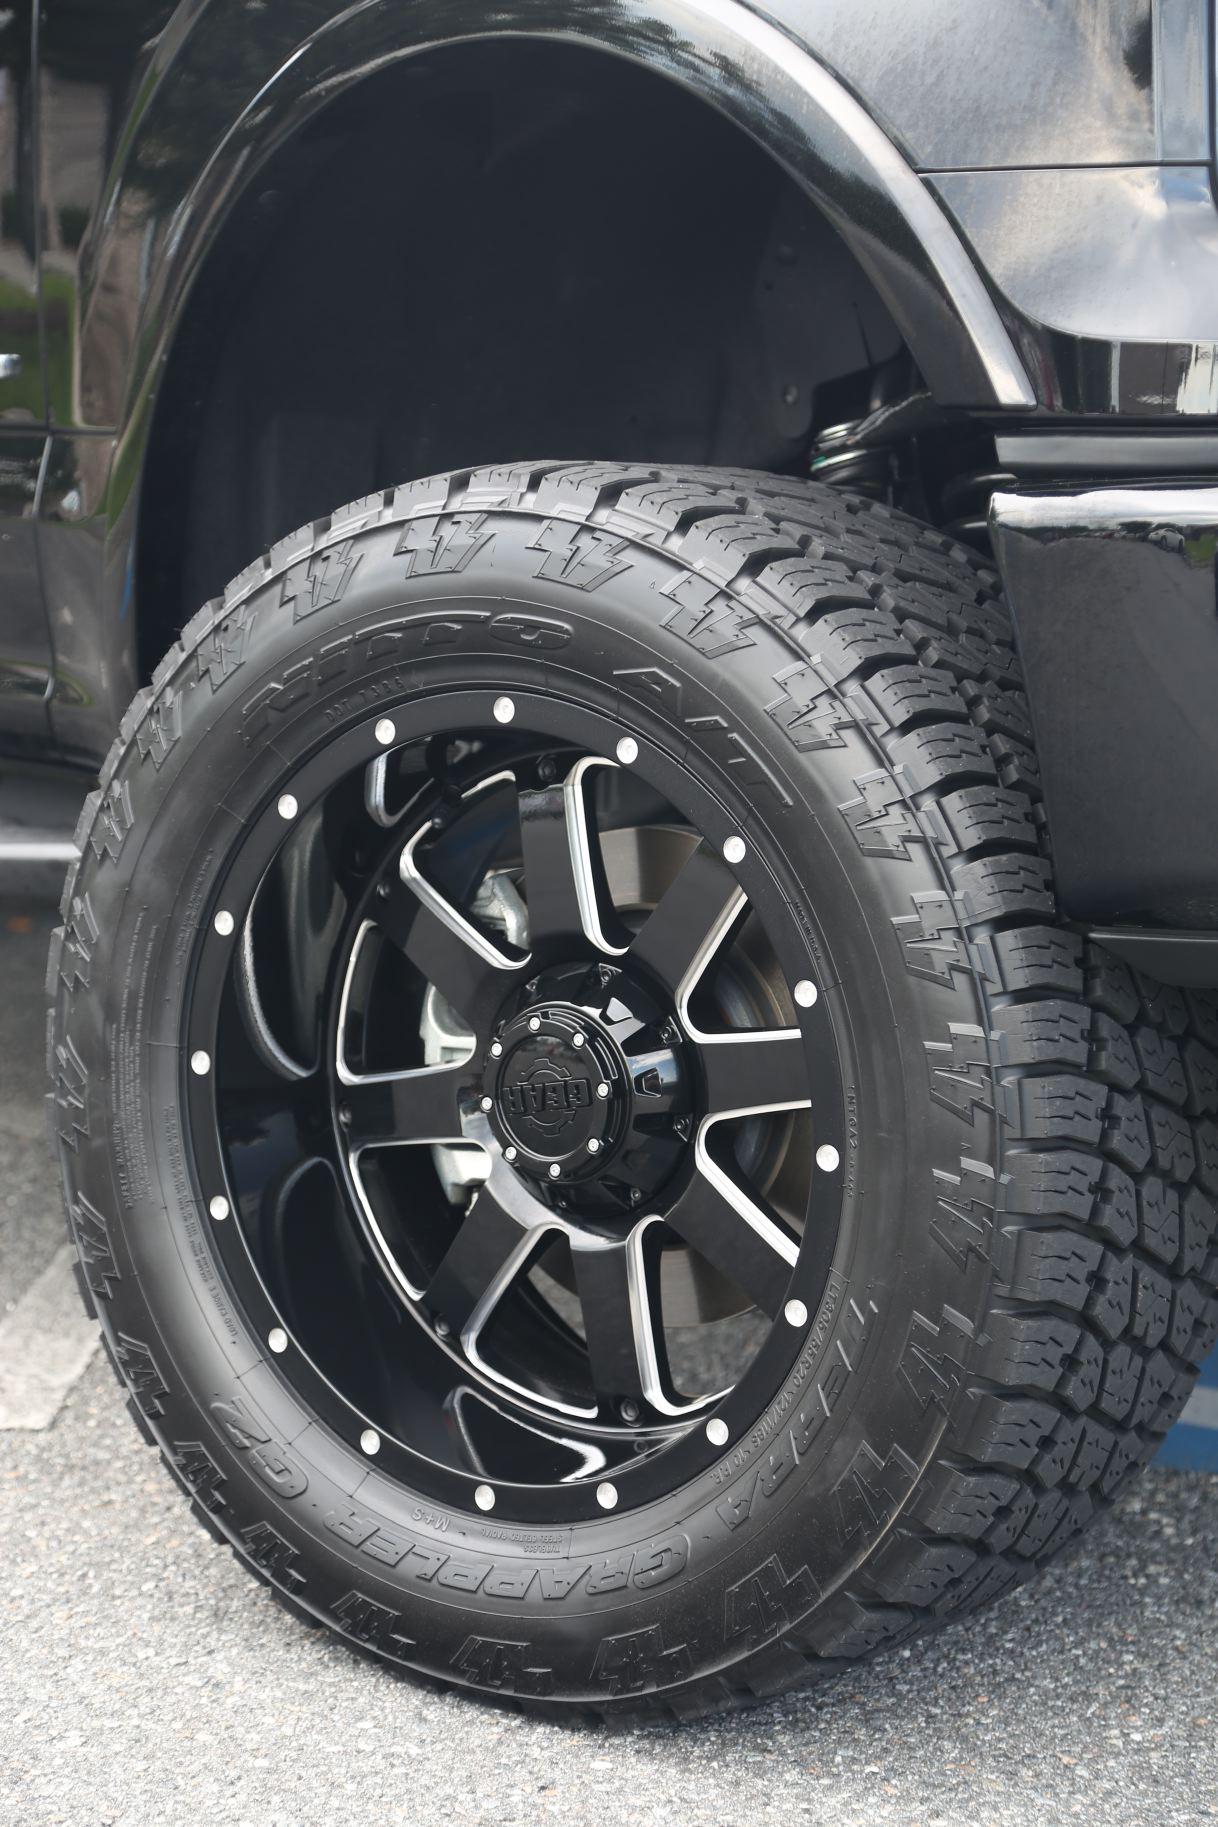 "6"" Lifted '16 Ford F150 on Gear Alloys - Trinity Motorsports"